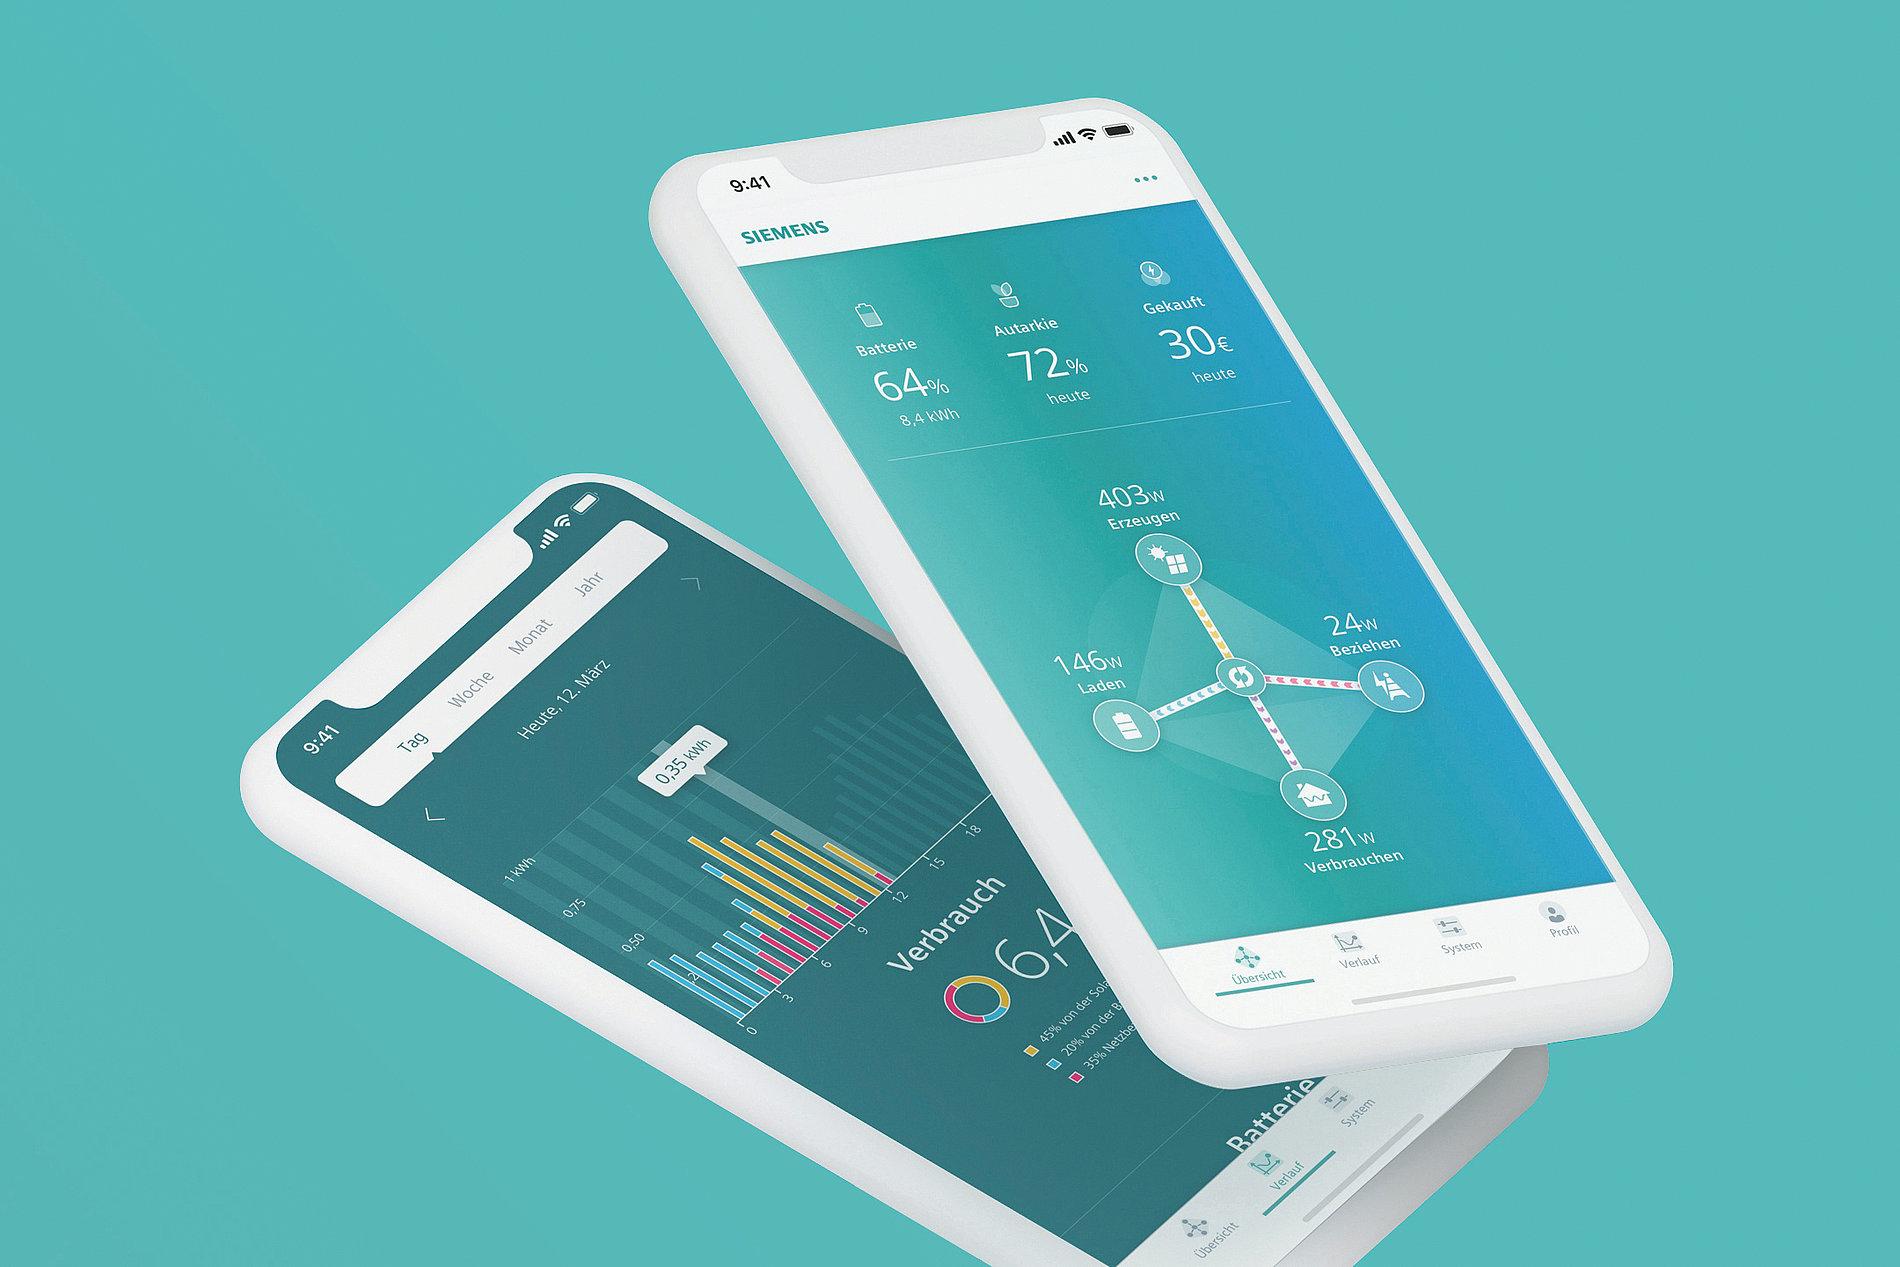 Junelight – Smart Battery Application | Red Dot Design Award